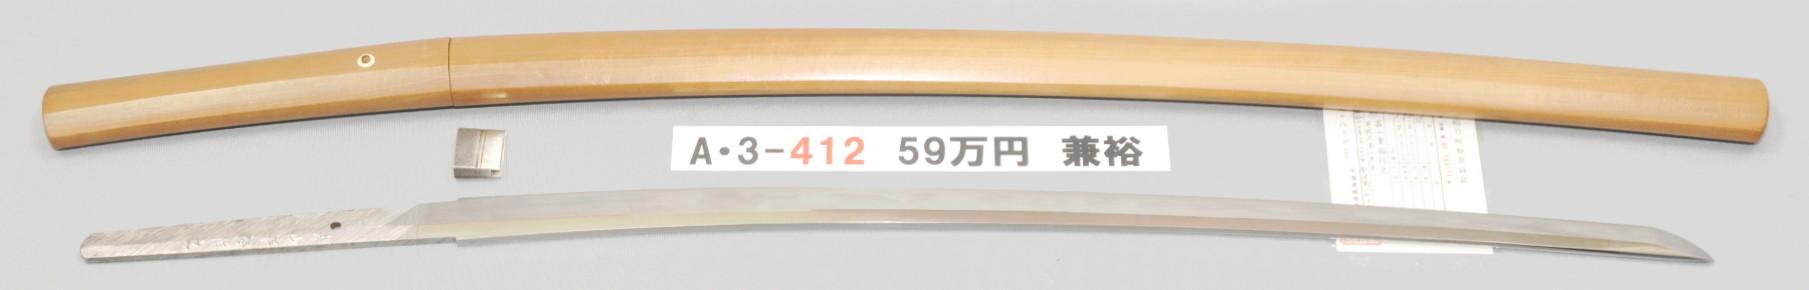 A3412